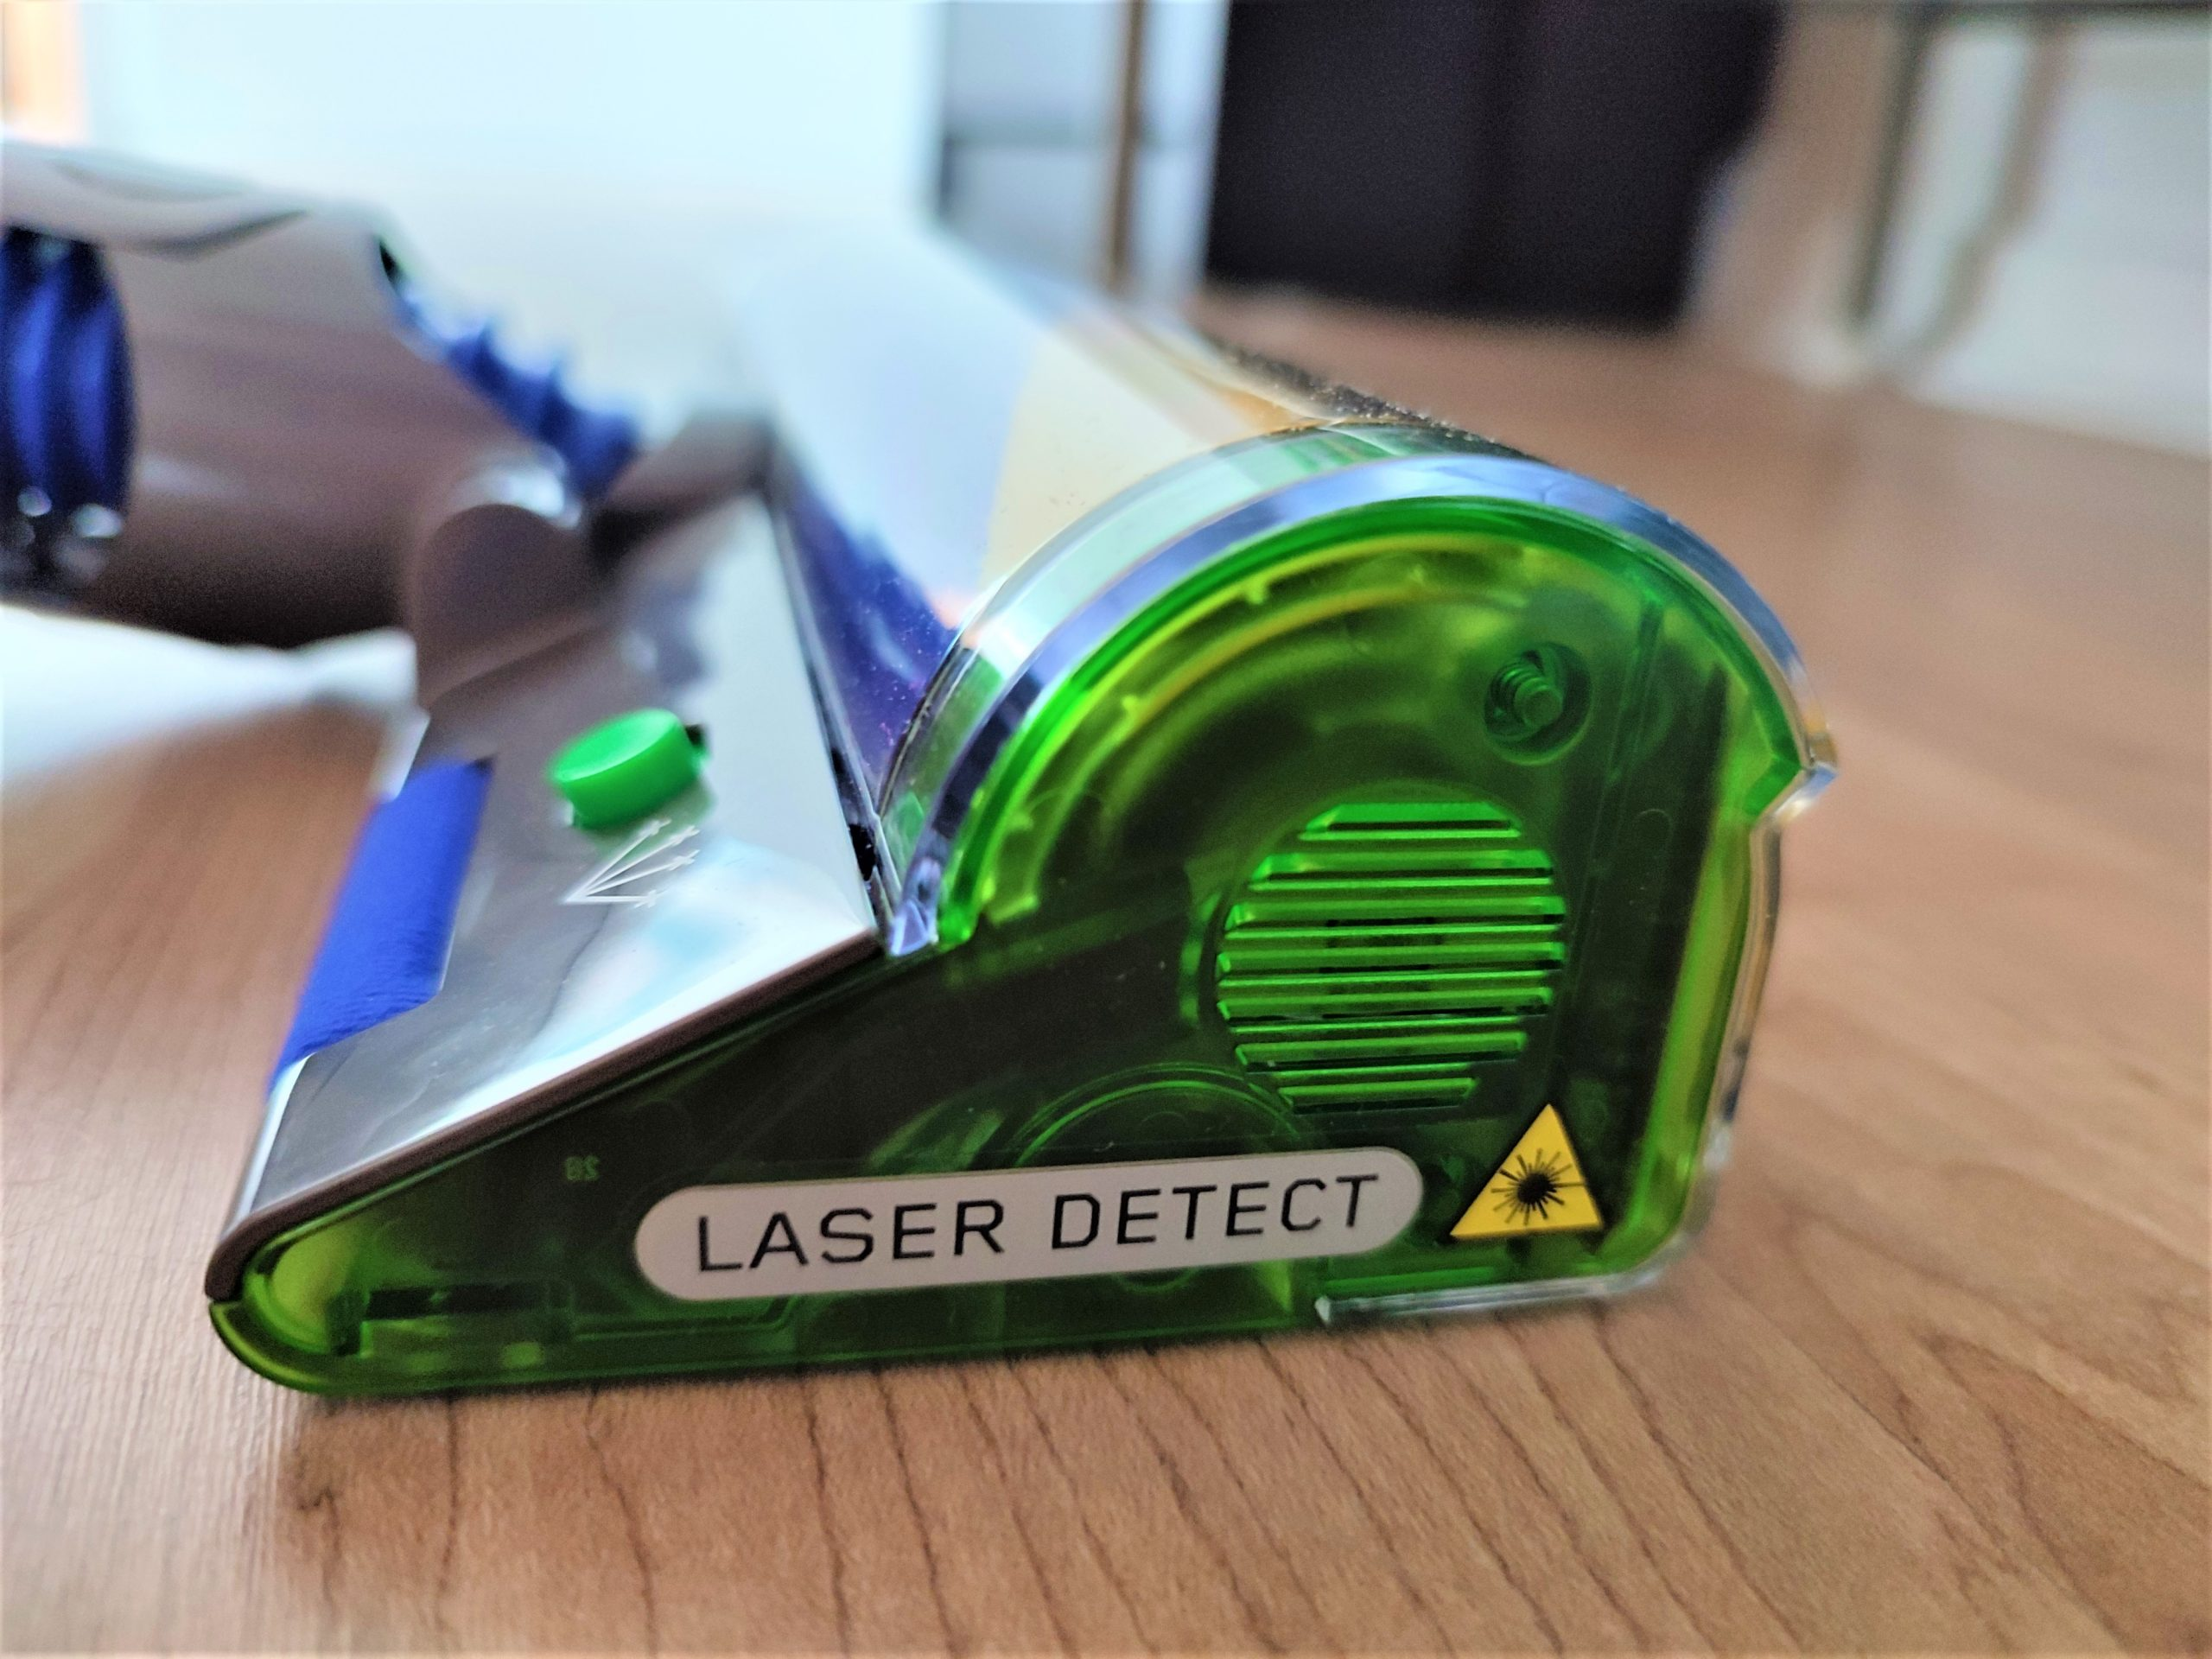 Dyson V15 Detect Akkusauger Laser Detektor